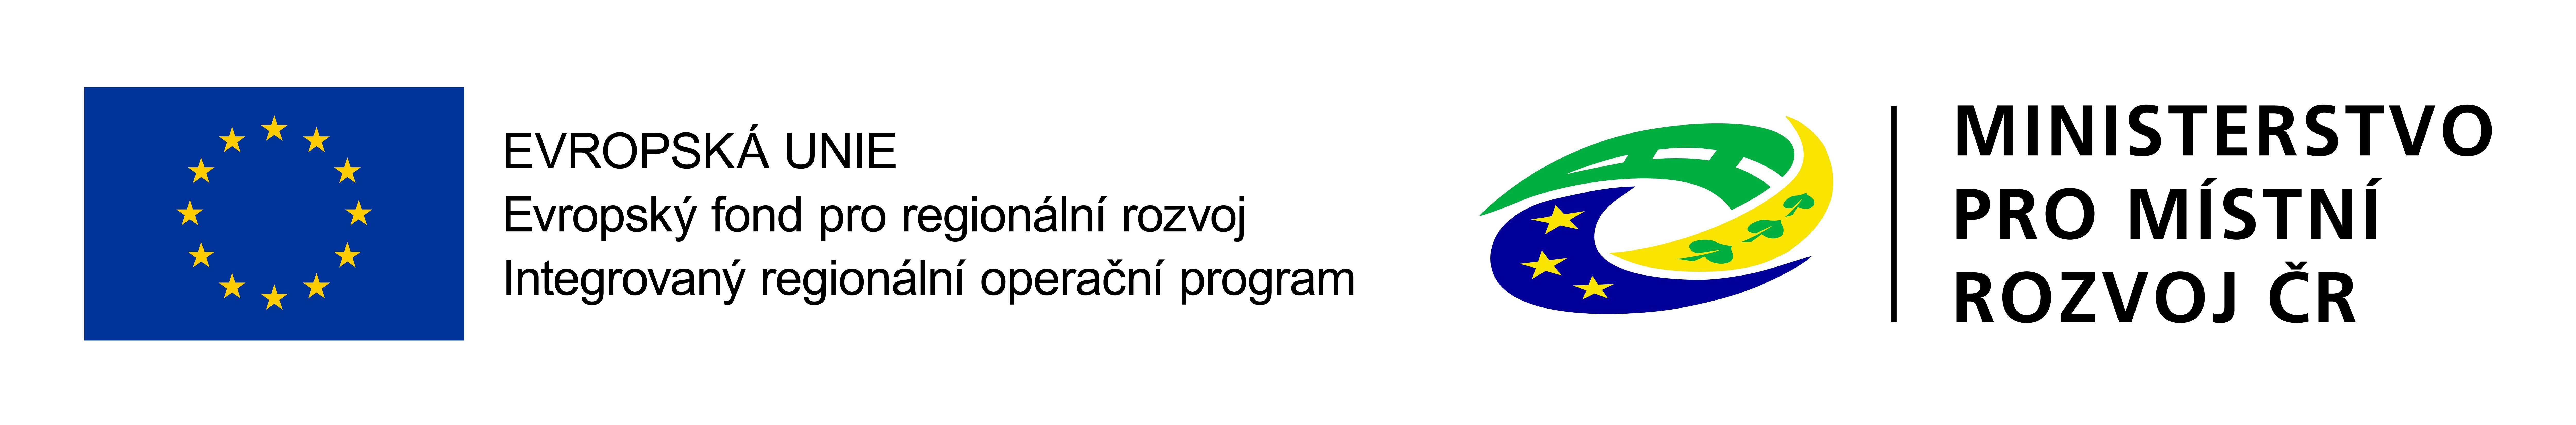 Logo pro Projekty publicita 2020